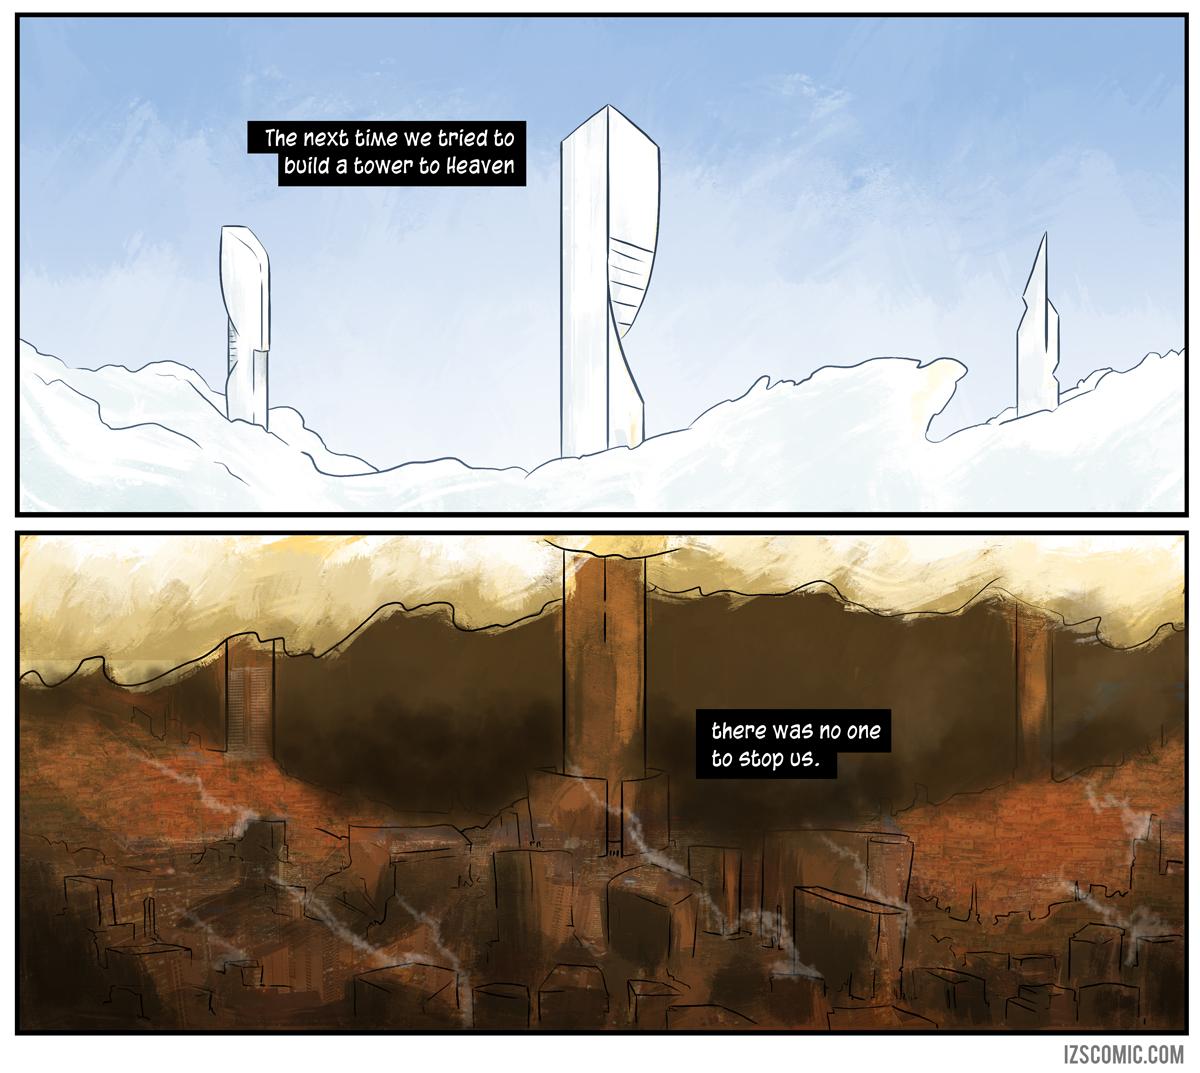 Even Heaven has a cost.